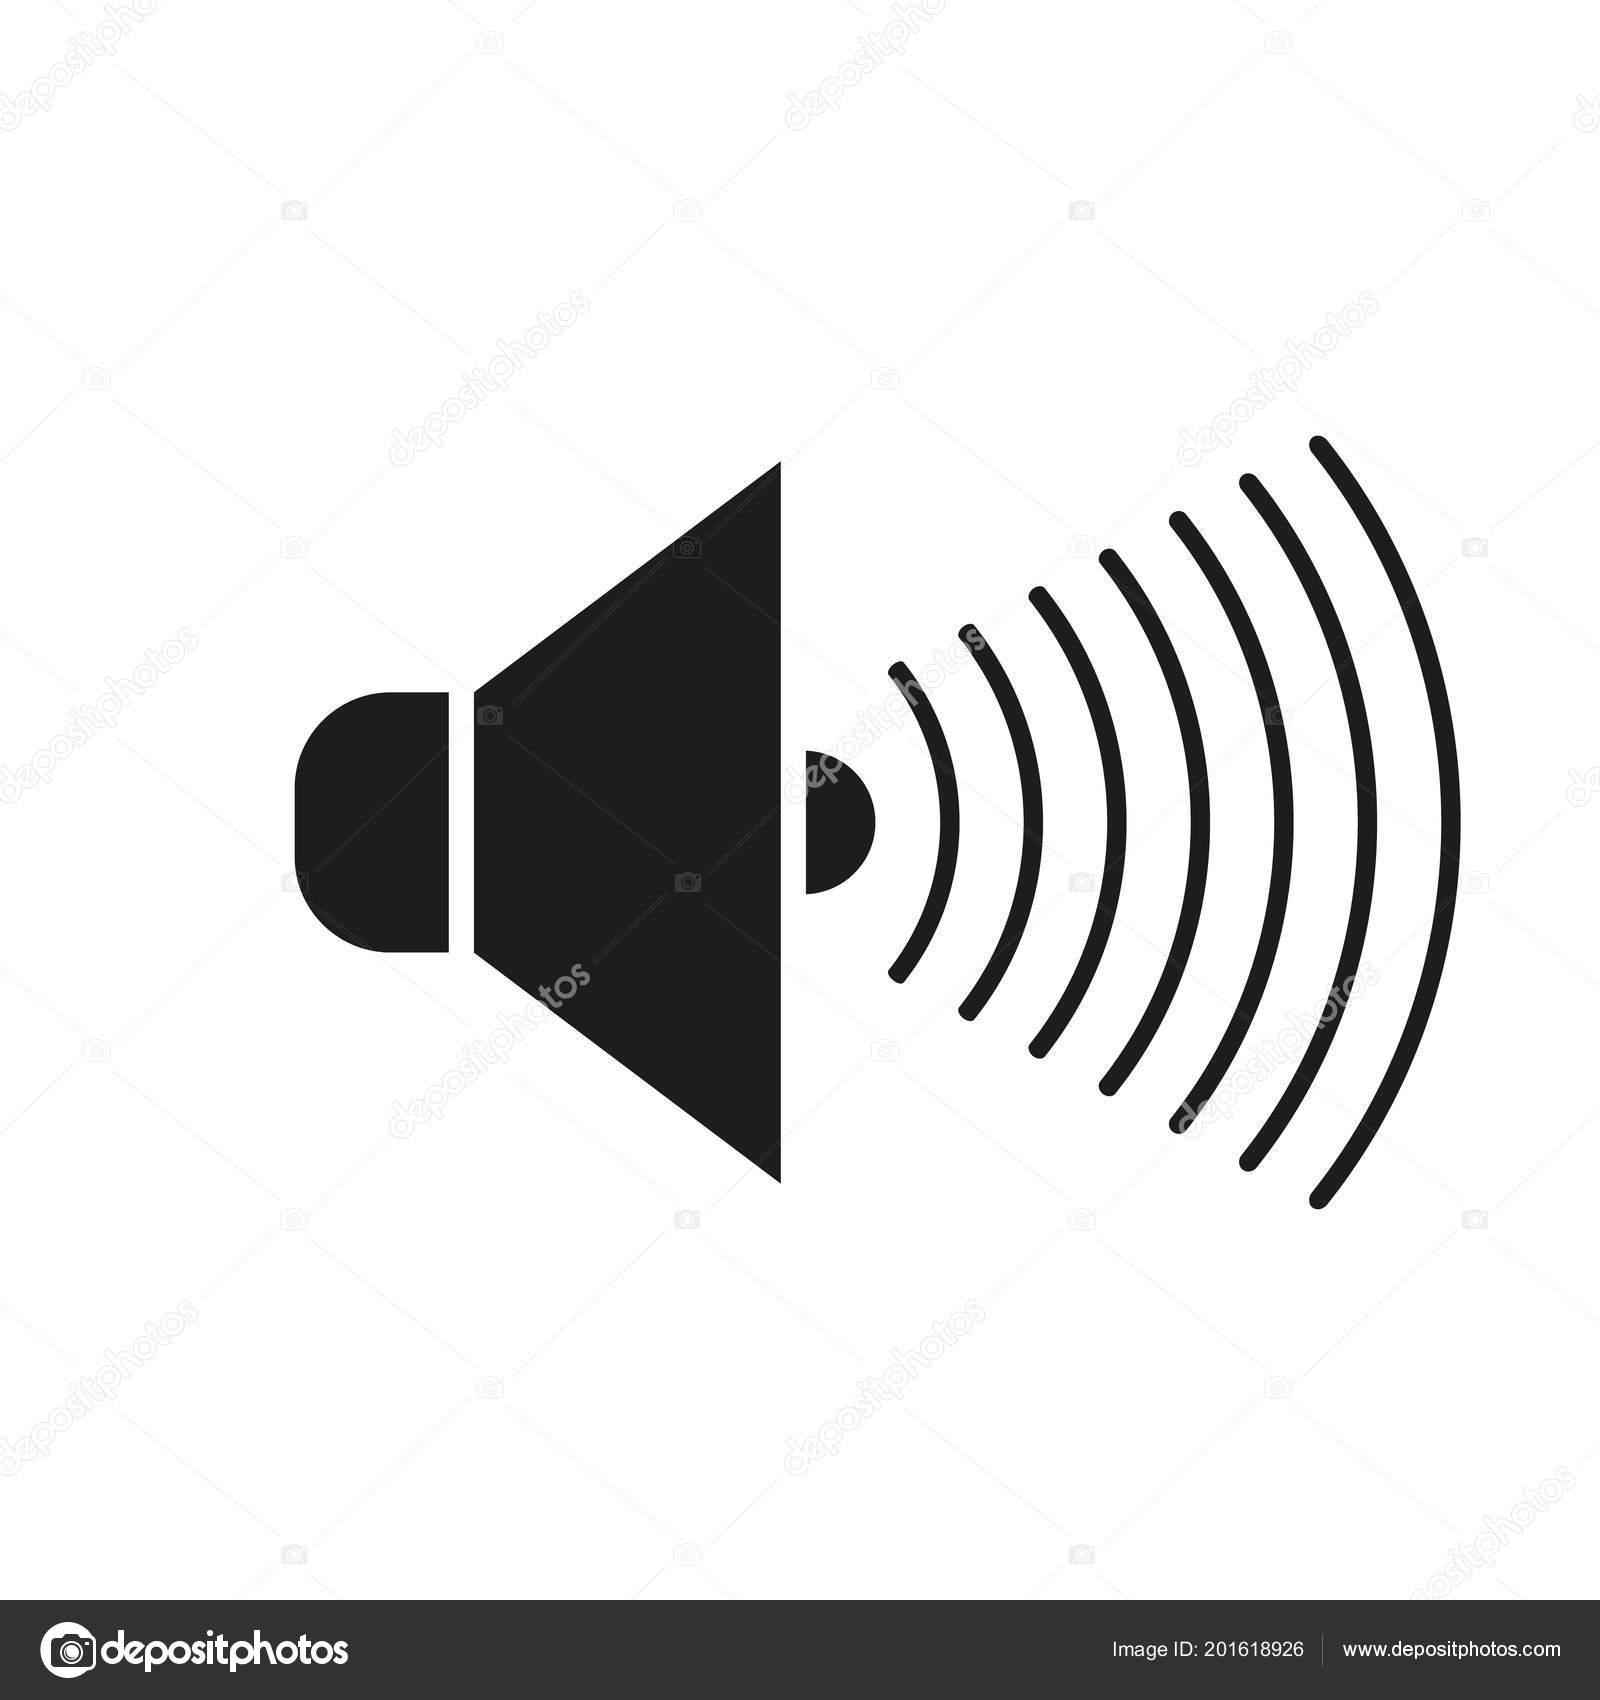 Noise Pollution Design Vector Illustration Eps Graphic